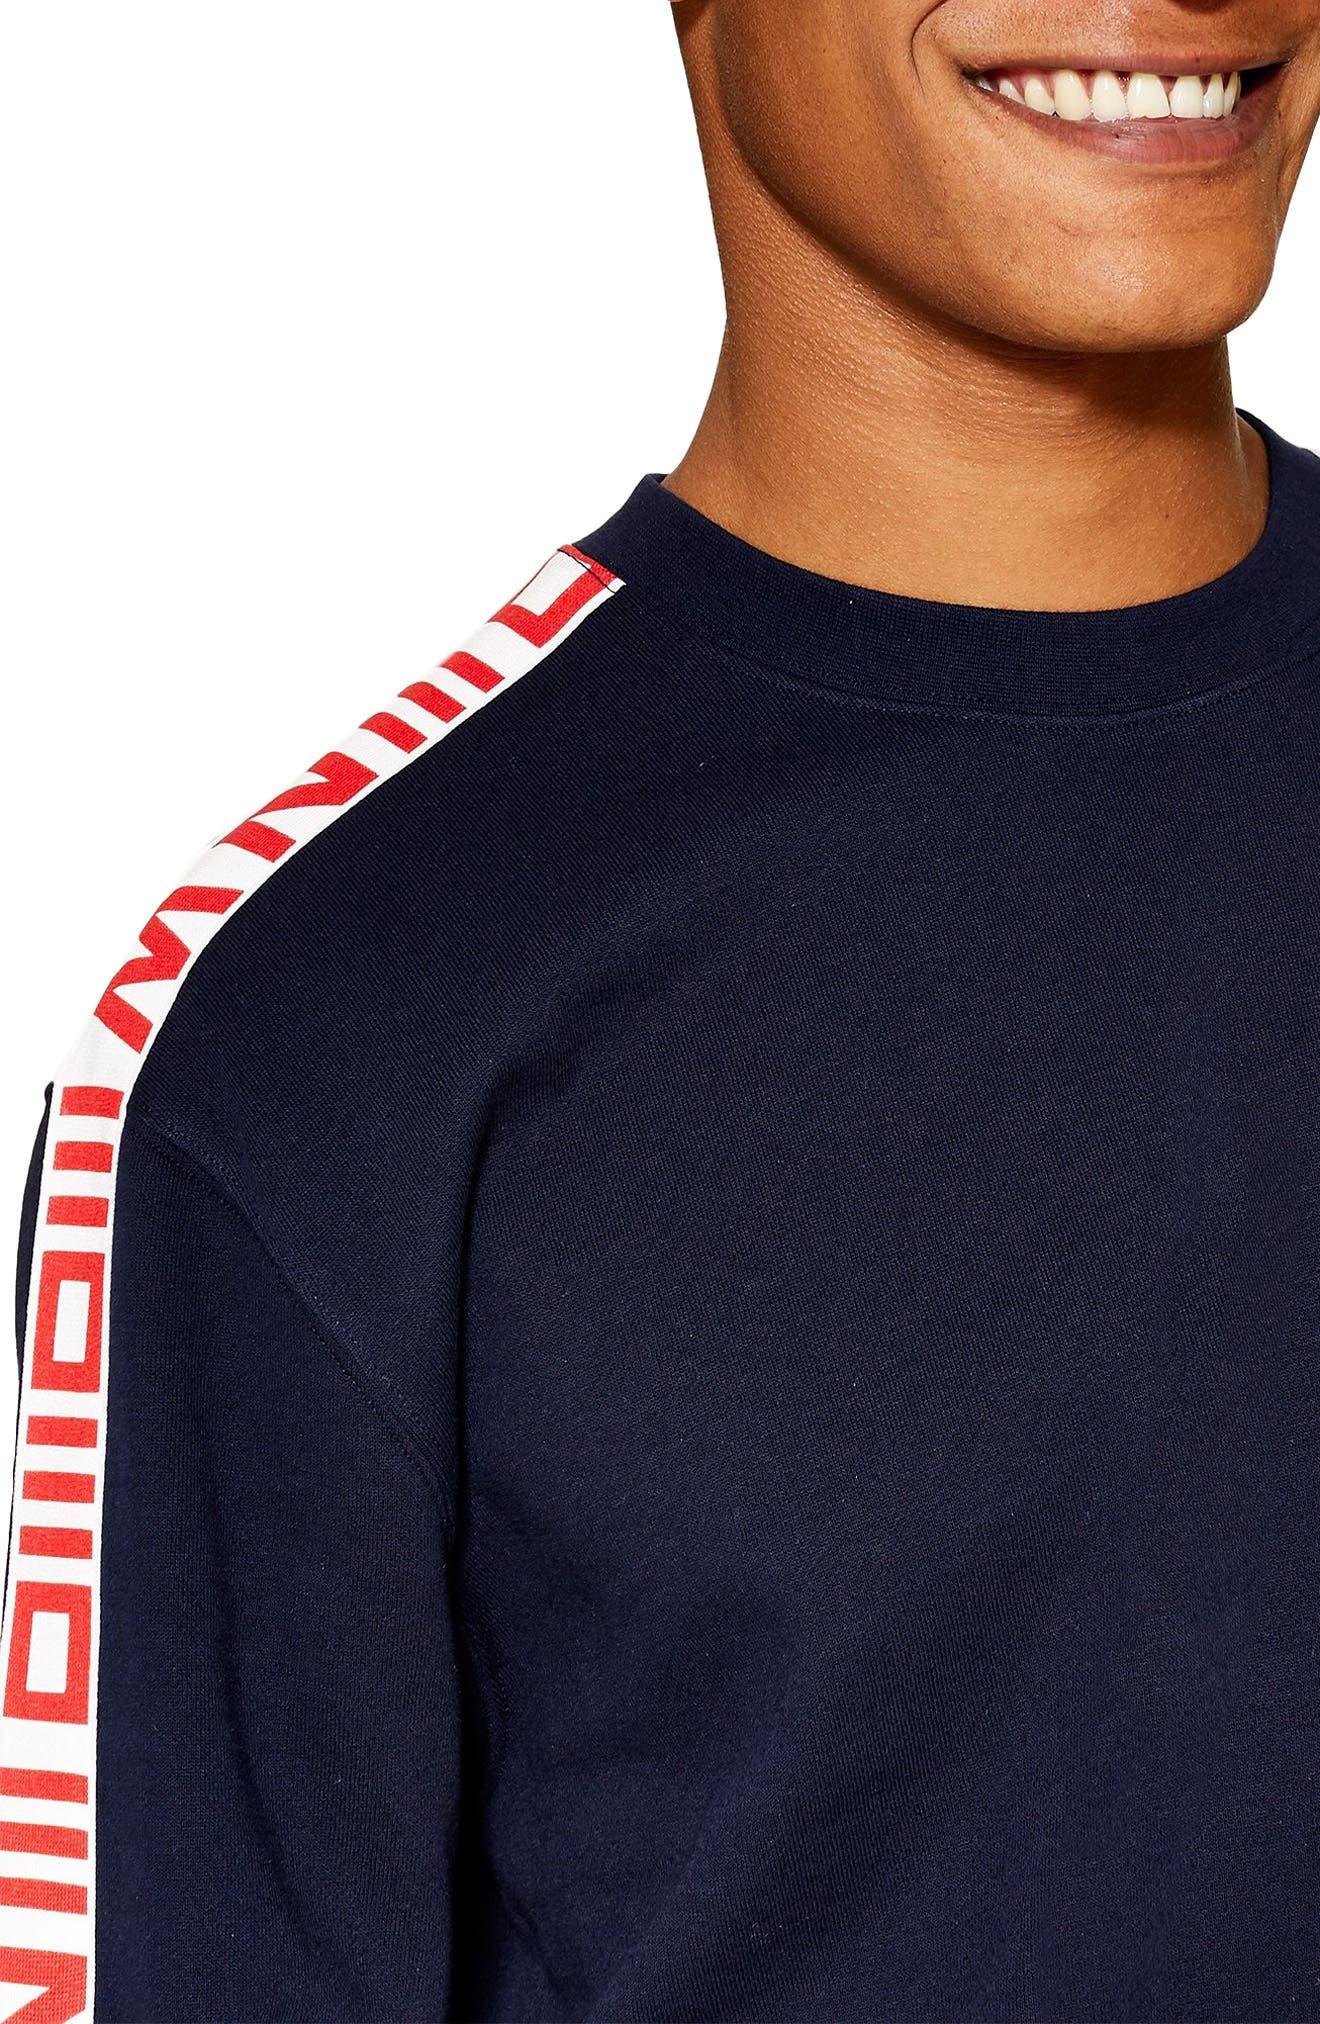 TOPMAN, Taped Crewneck Sweatshirt, Alternate thumbnail 3, color, NAVY MULTI